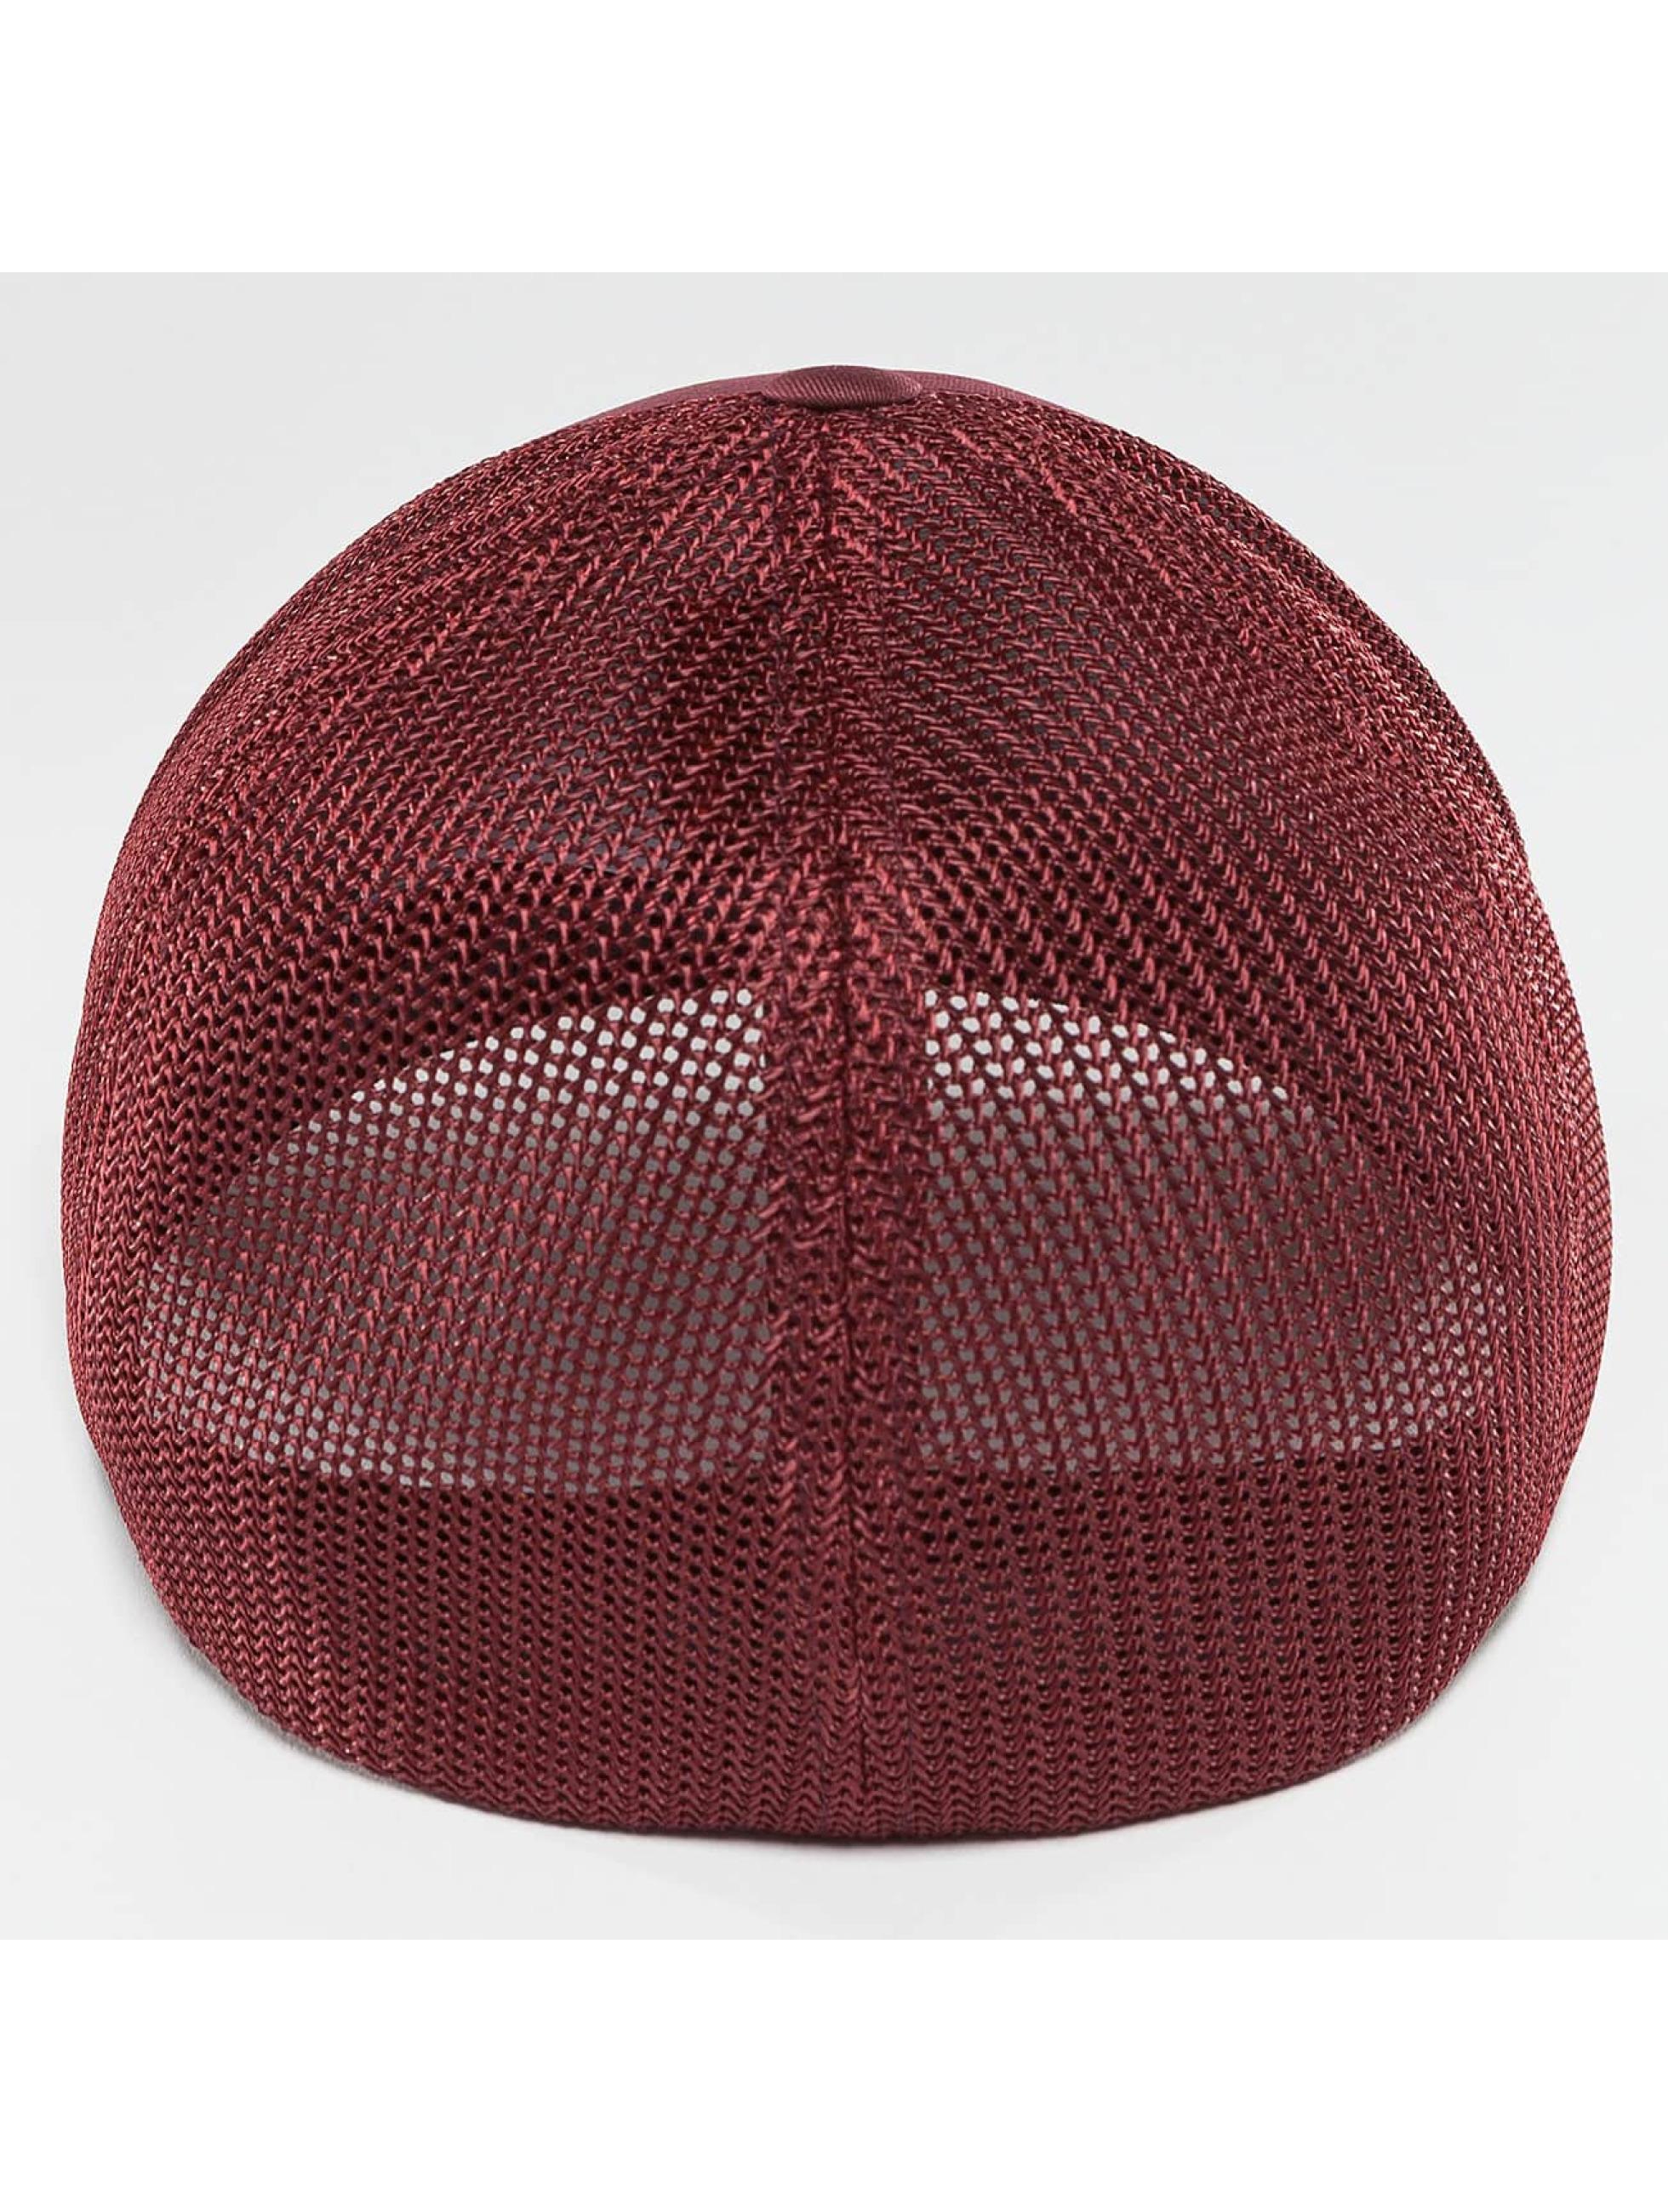 Flexfit Casquette Flex Fitted Mesh Cotton Twill rouge